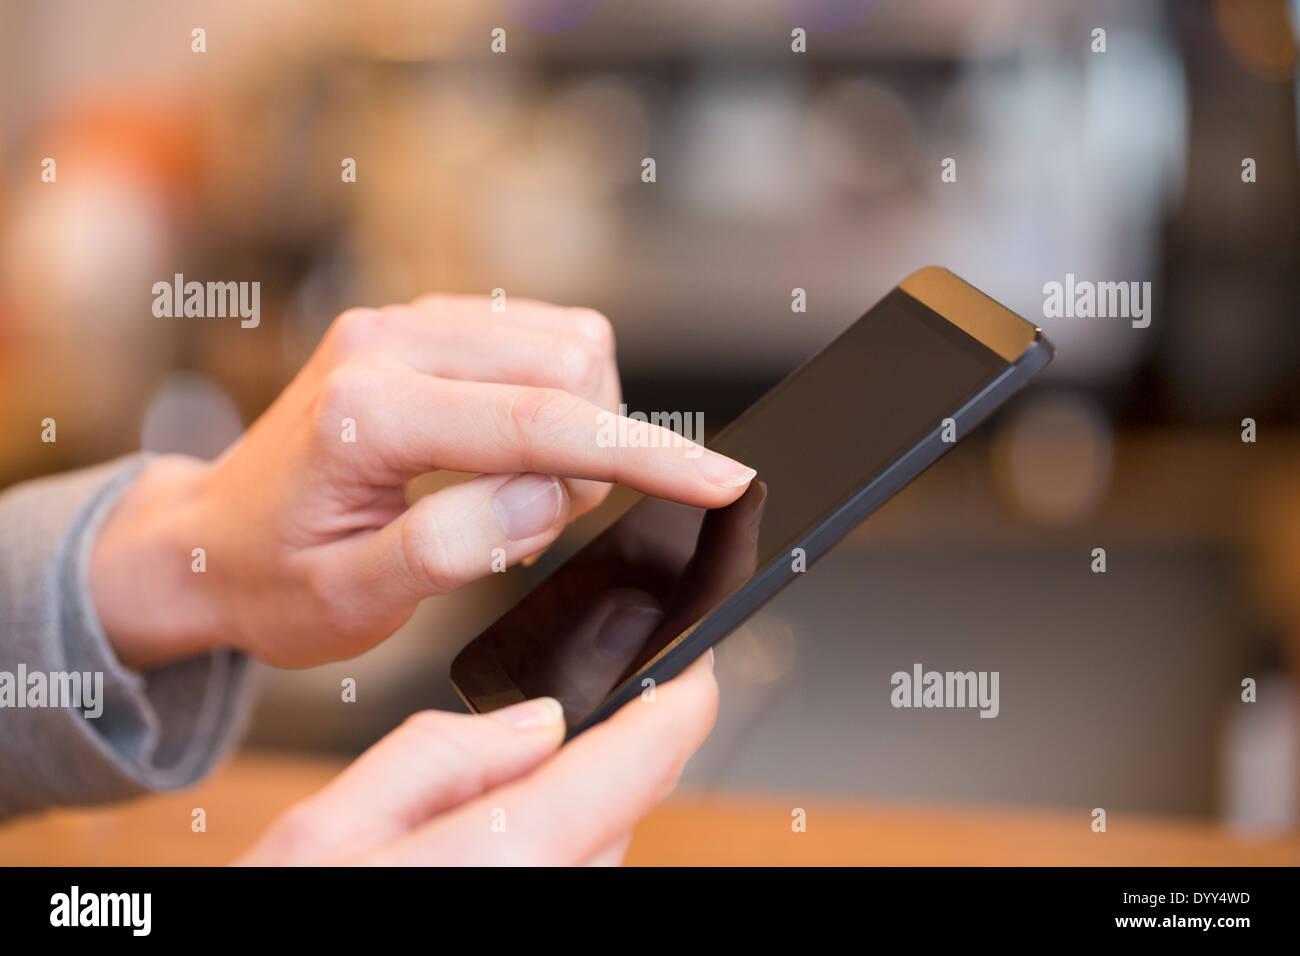 Sms sms pub smartphone féminin doigts Banque D'Images